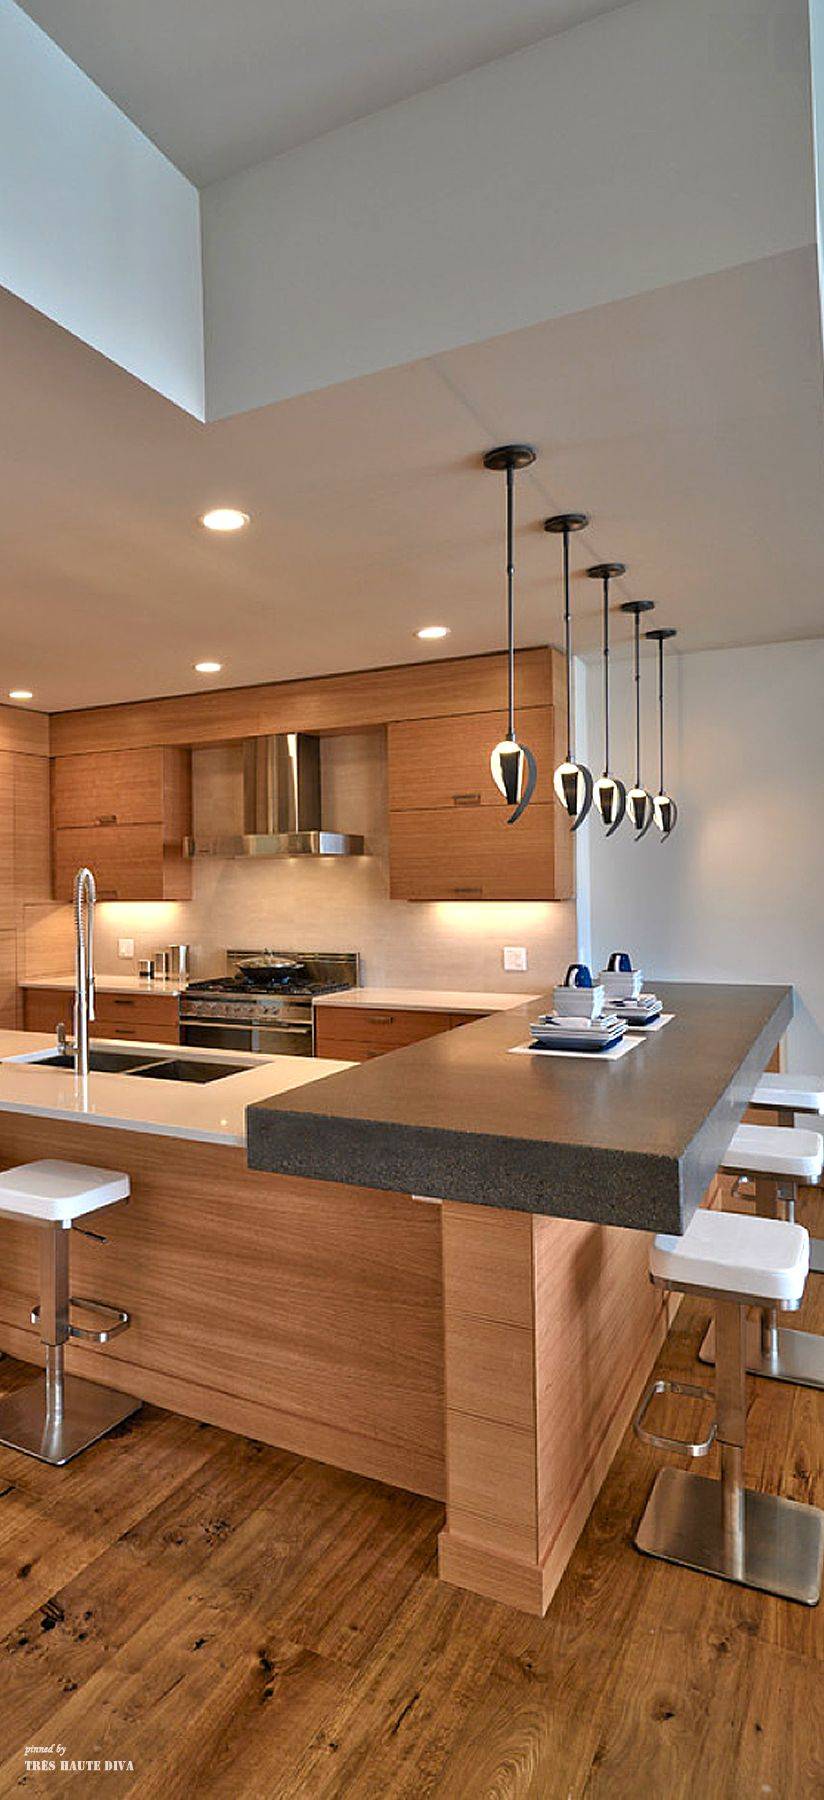 elegant contemporary kitchen ideas breakfast bars wood colors